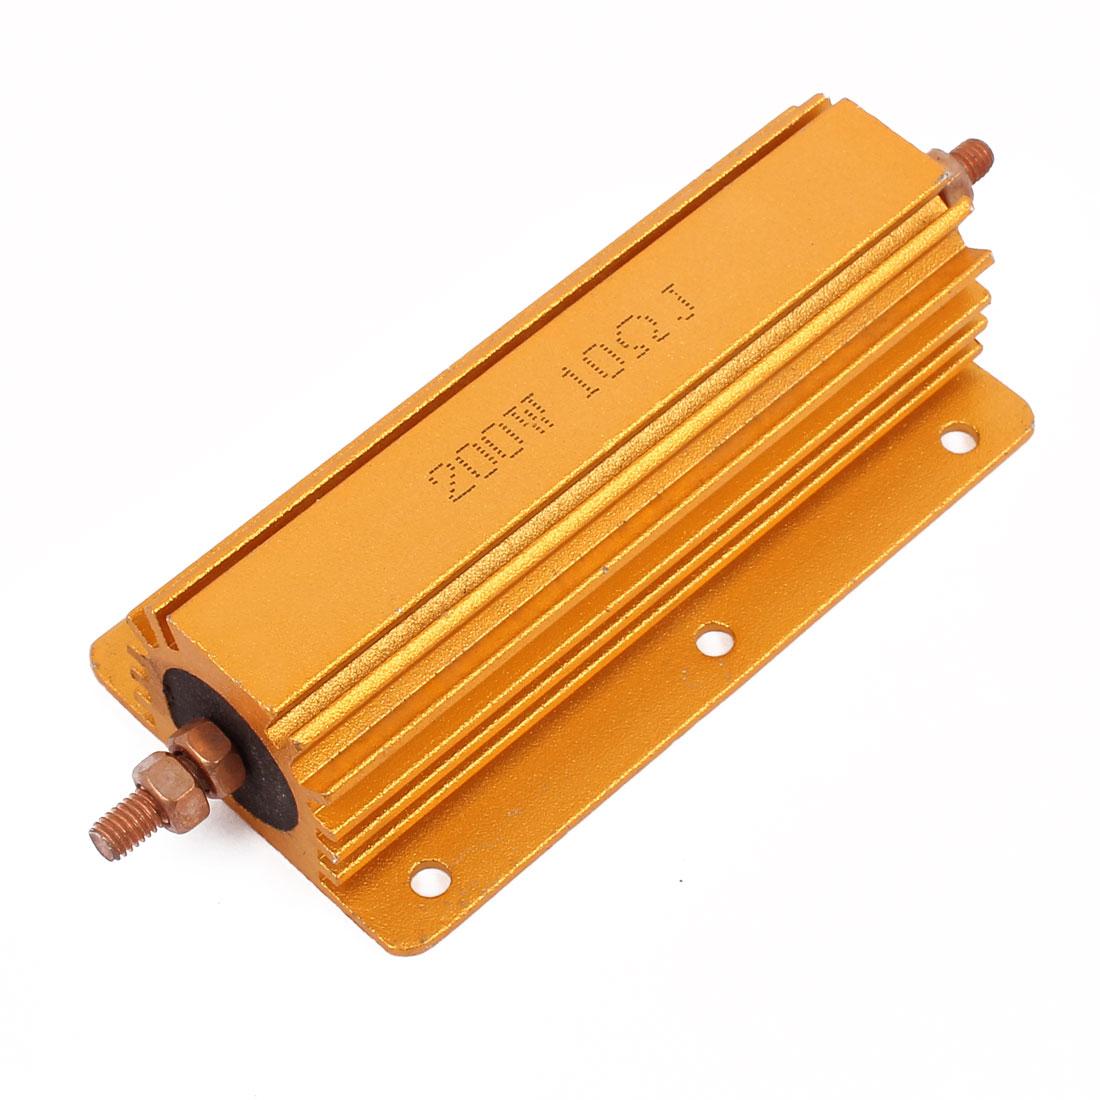 5% 200W 10 Ohm Axial Lead Gold Tone Heatsink Aluminum Clad Resistor